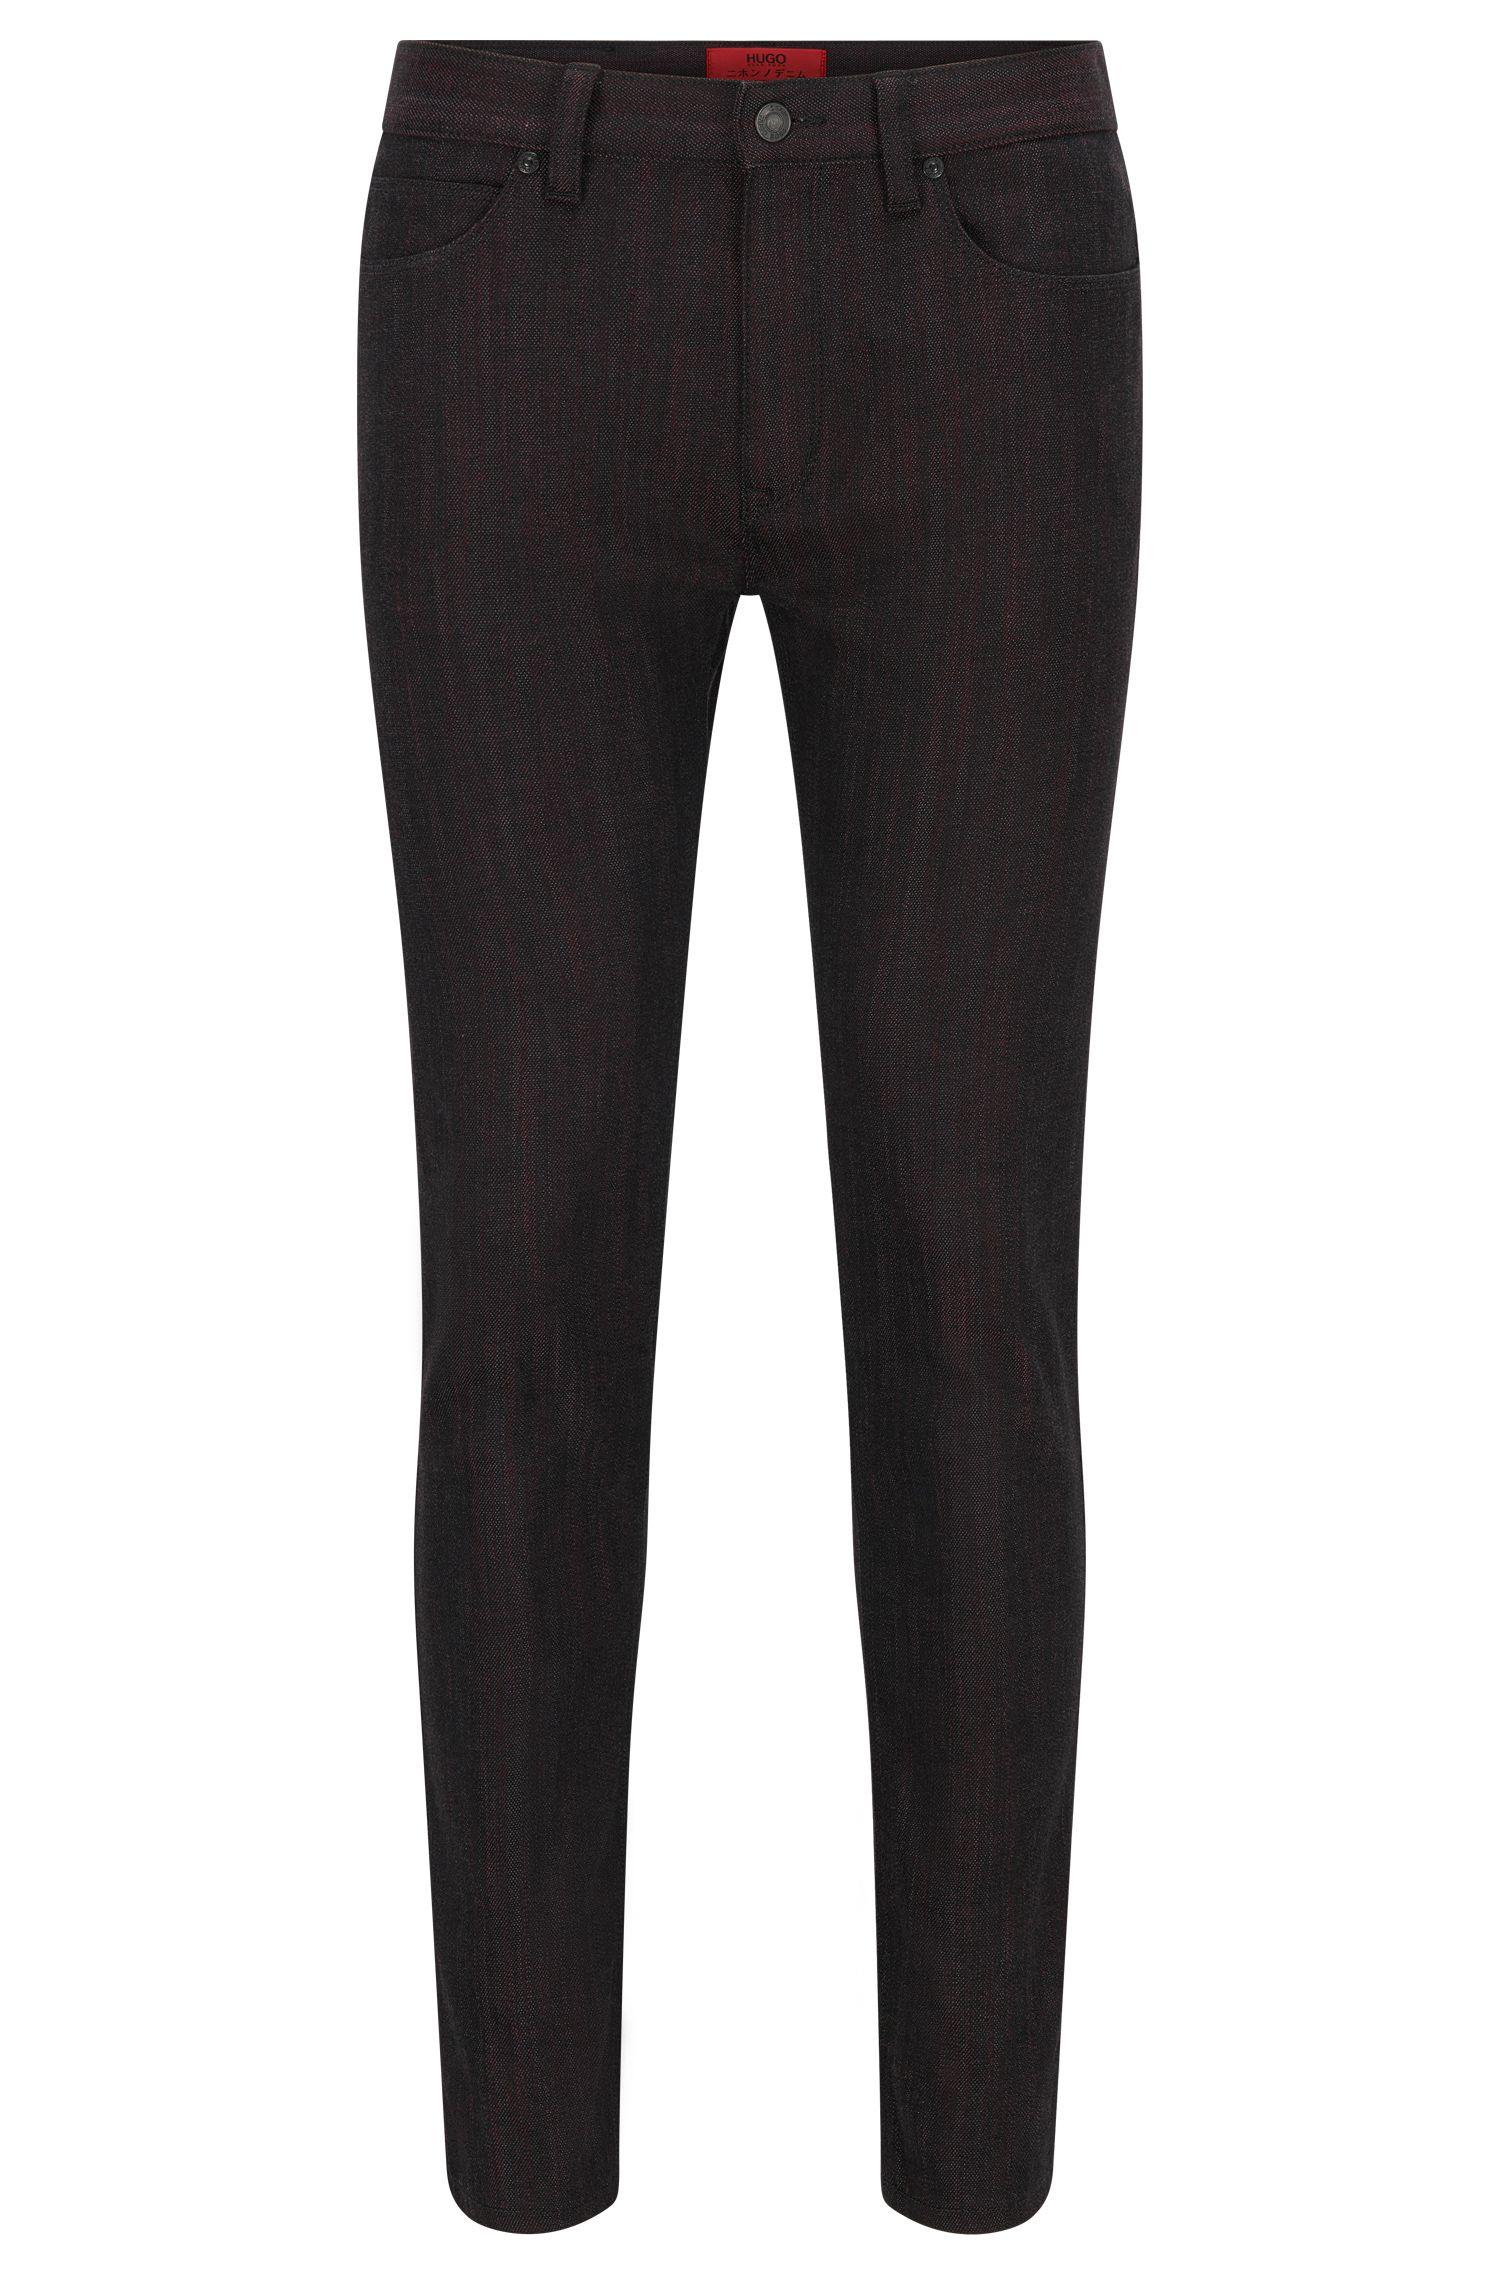 10 oz Japanese Stretch Cotton Jeans, Skinny Fit | Hugo 734